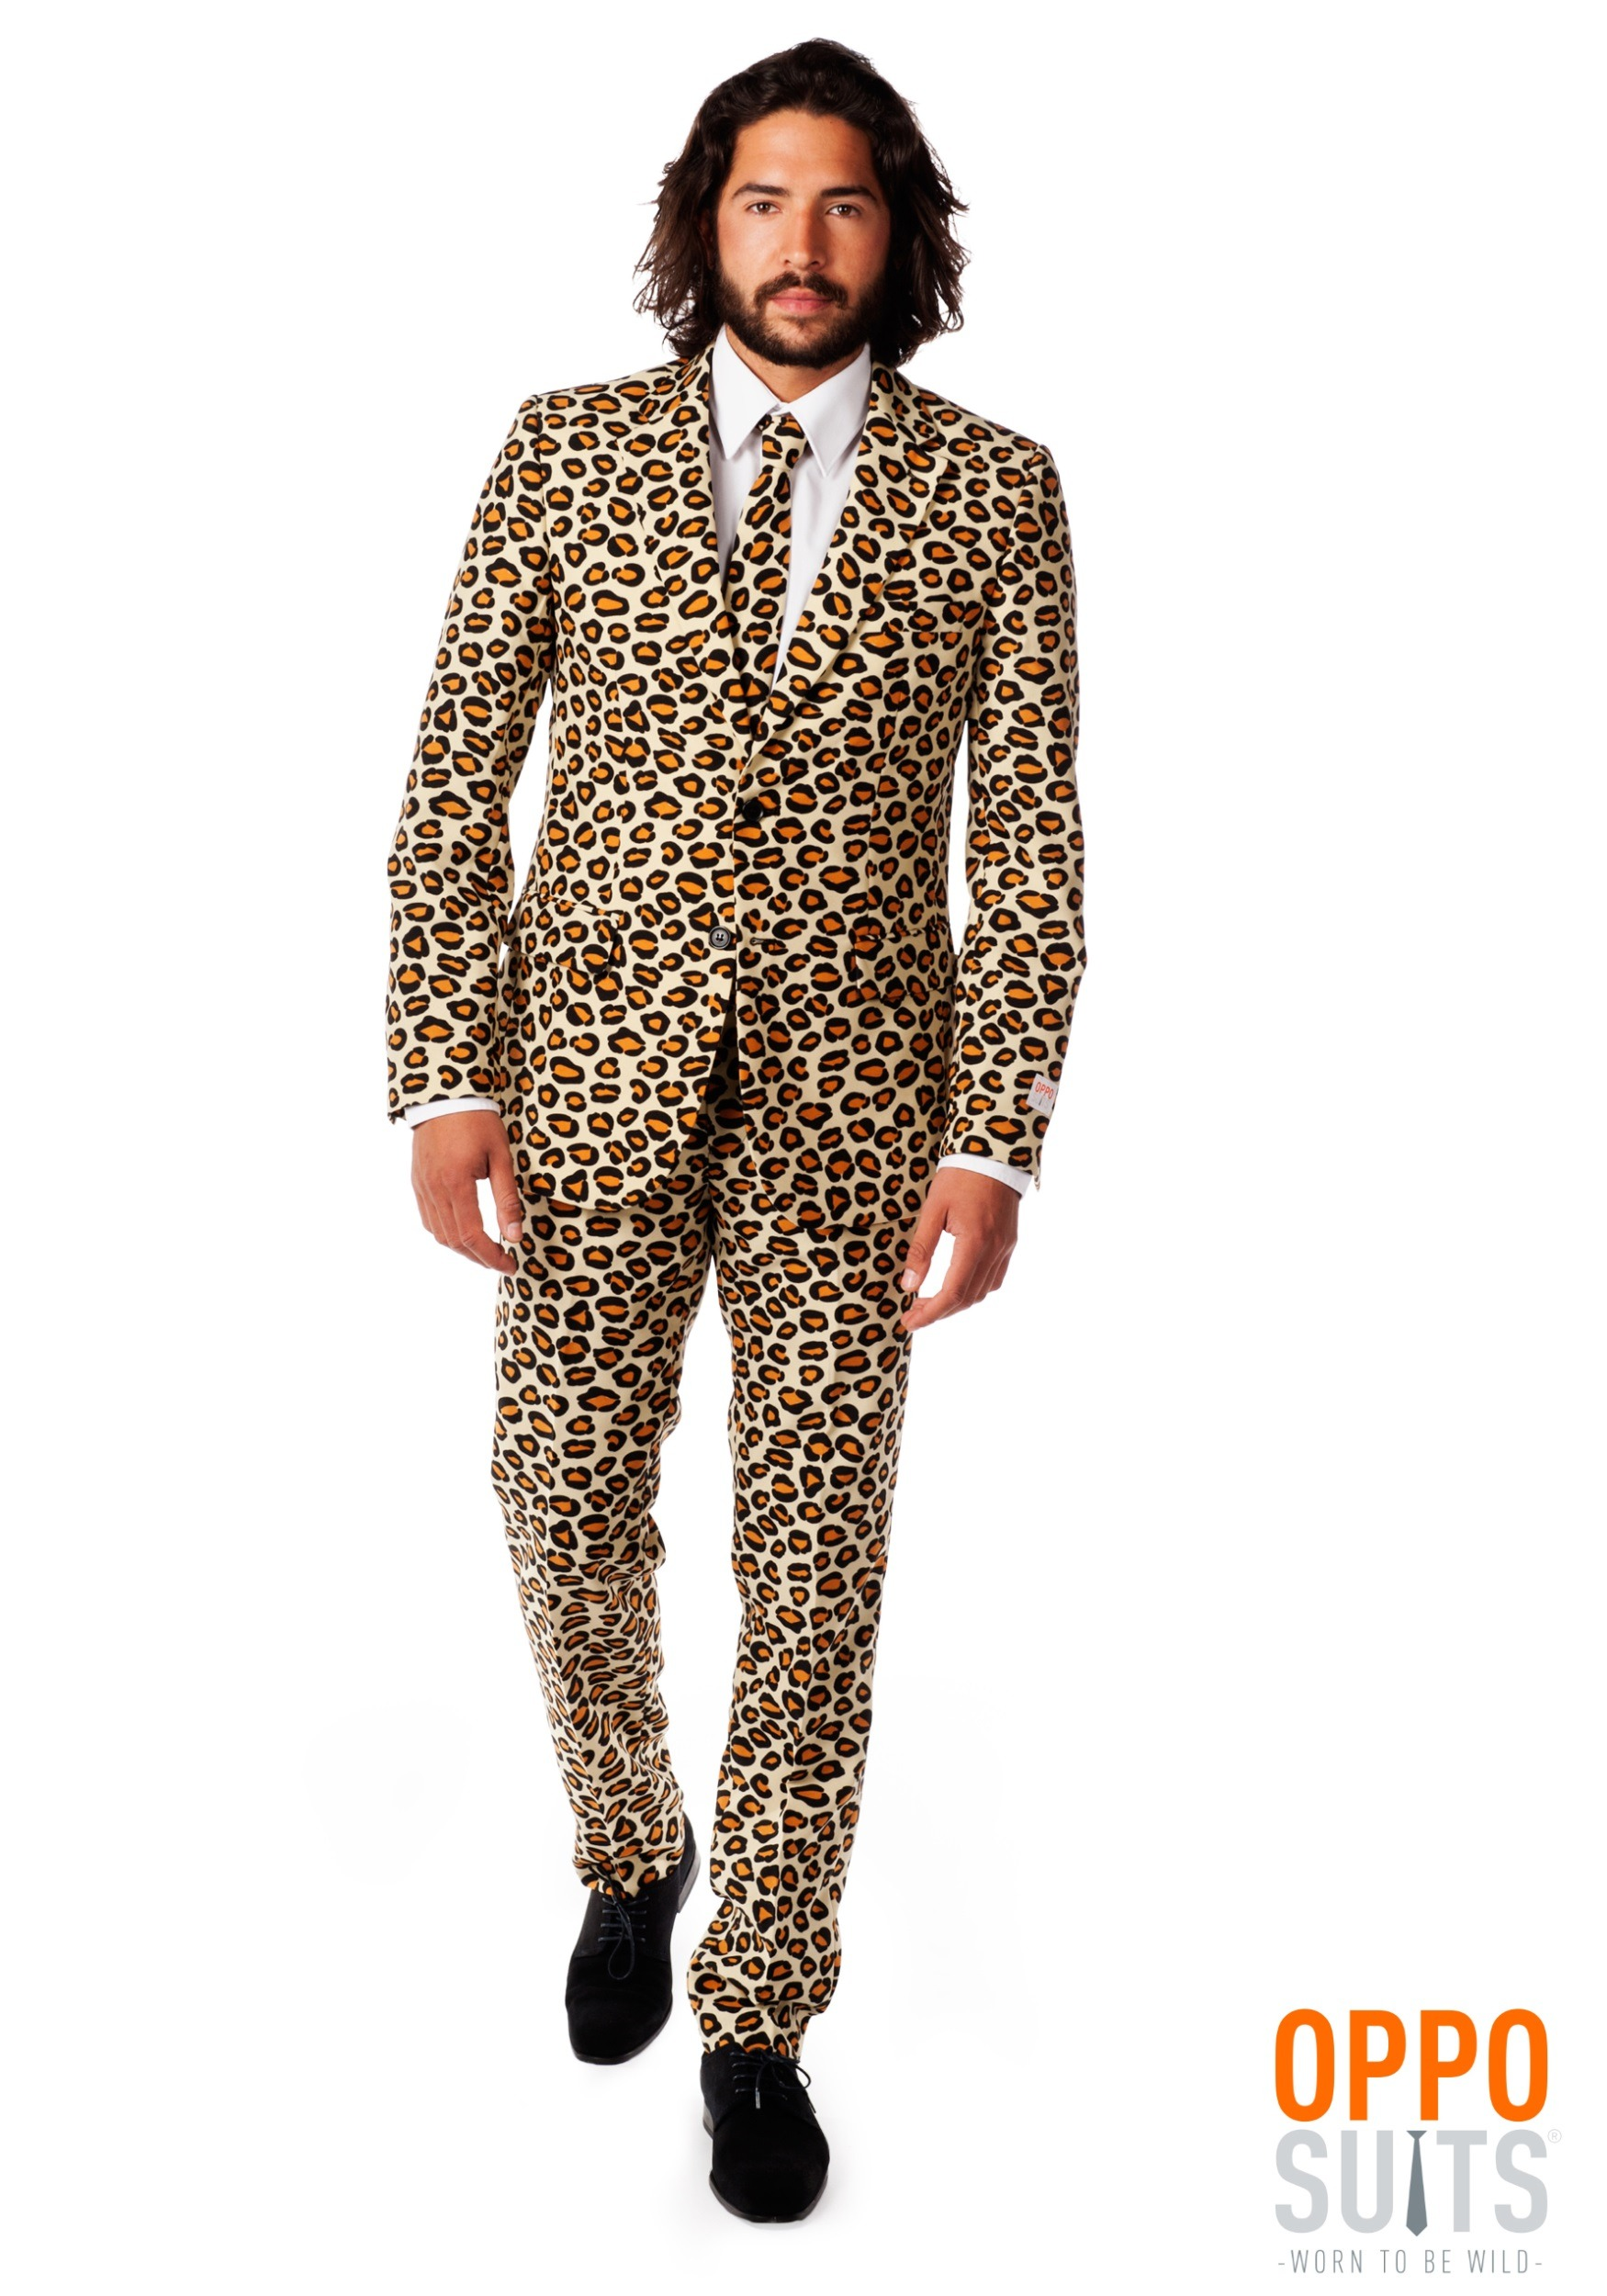 Menu0027s OppoSuits Jaguar Animal Printed Suit  sc 1 st  Fun.com & OppoSuits Jaguar Animal Printed Suit for Men